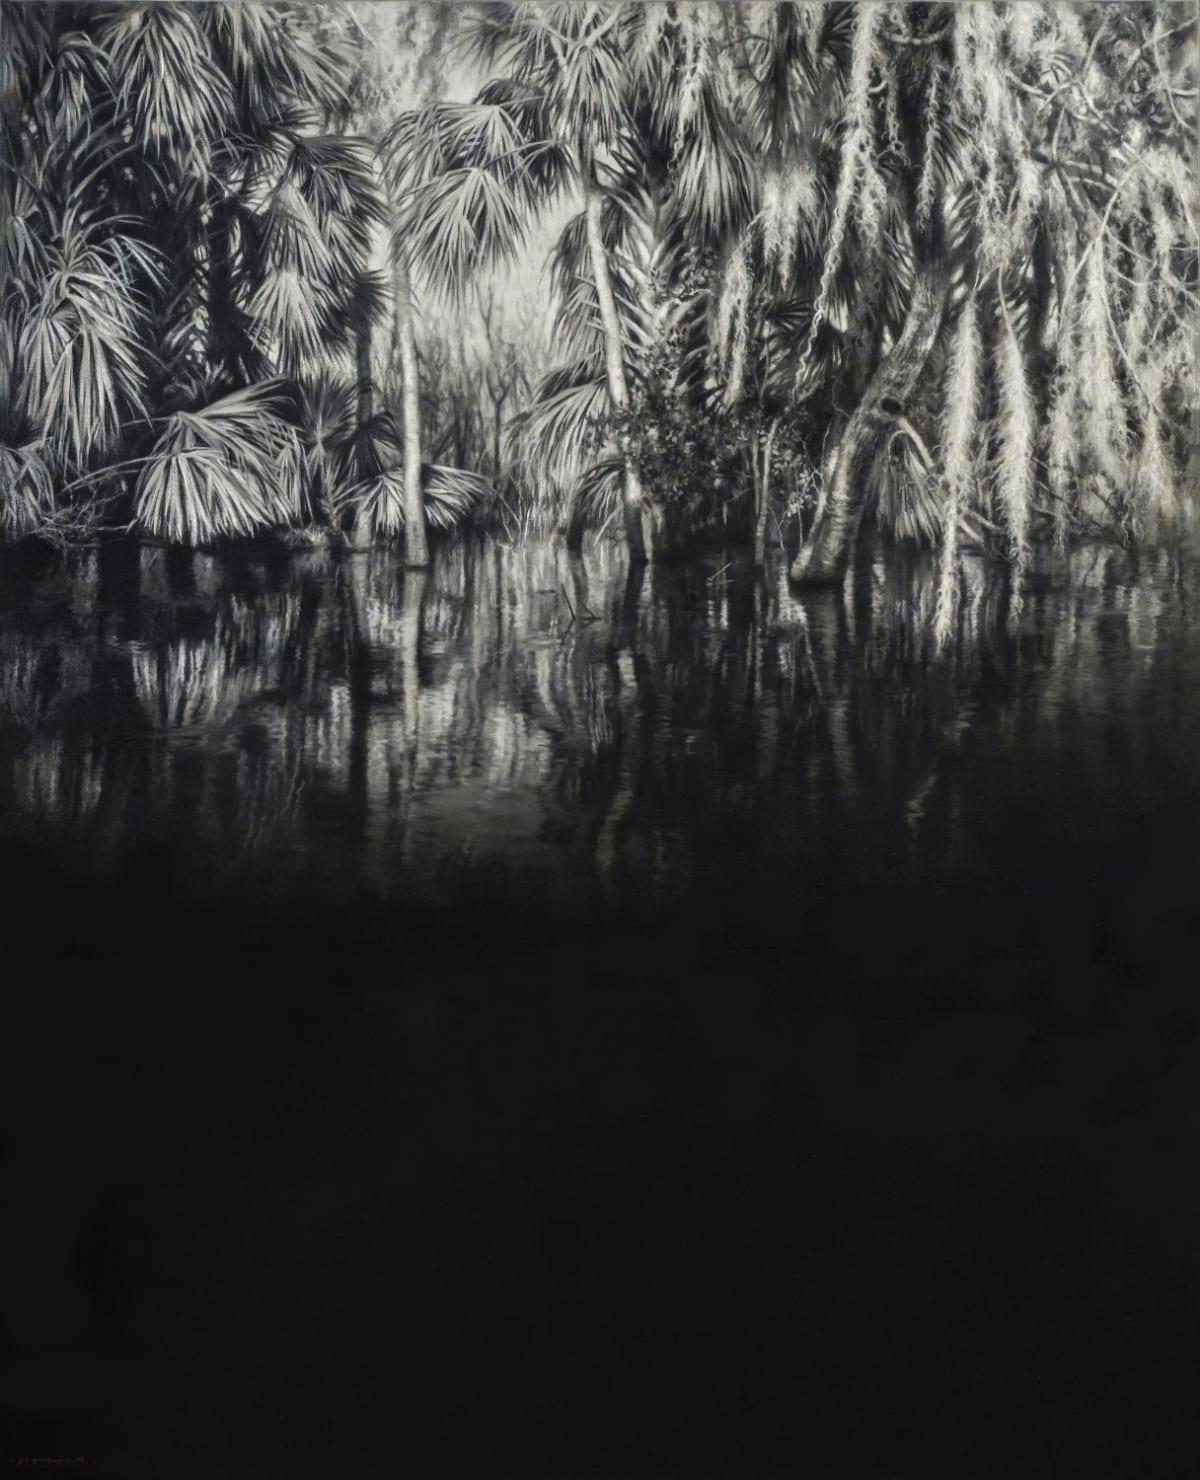 Jaco van Schalkwyk, Therapy for Narcissus, 2019